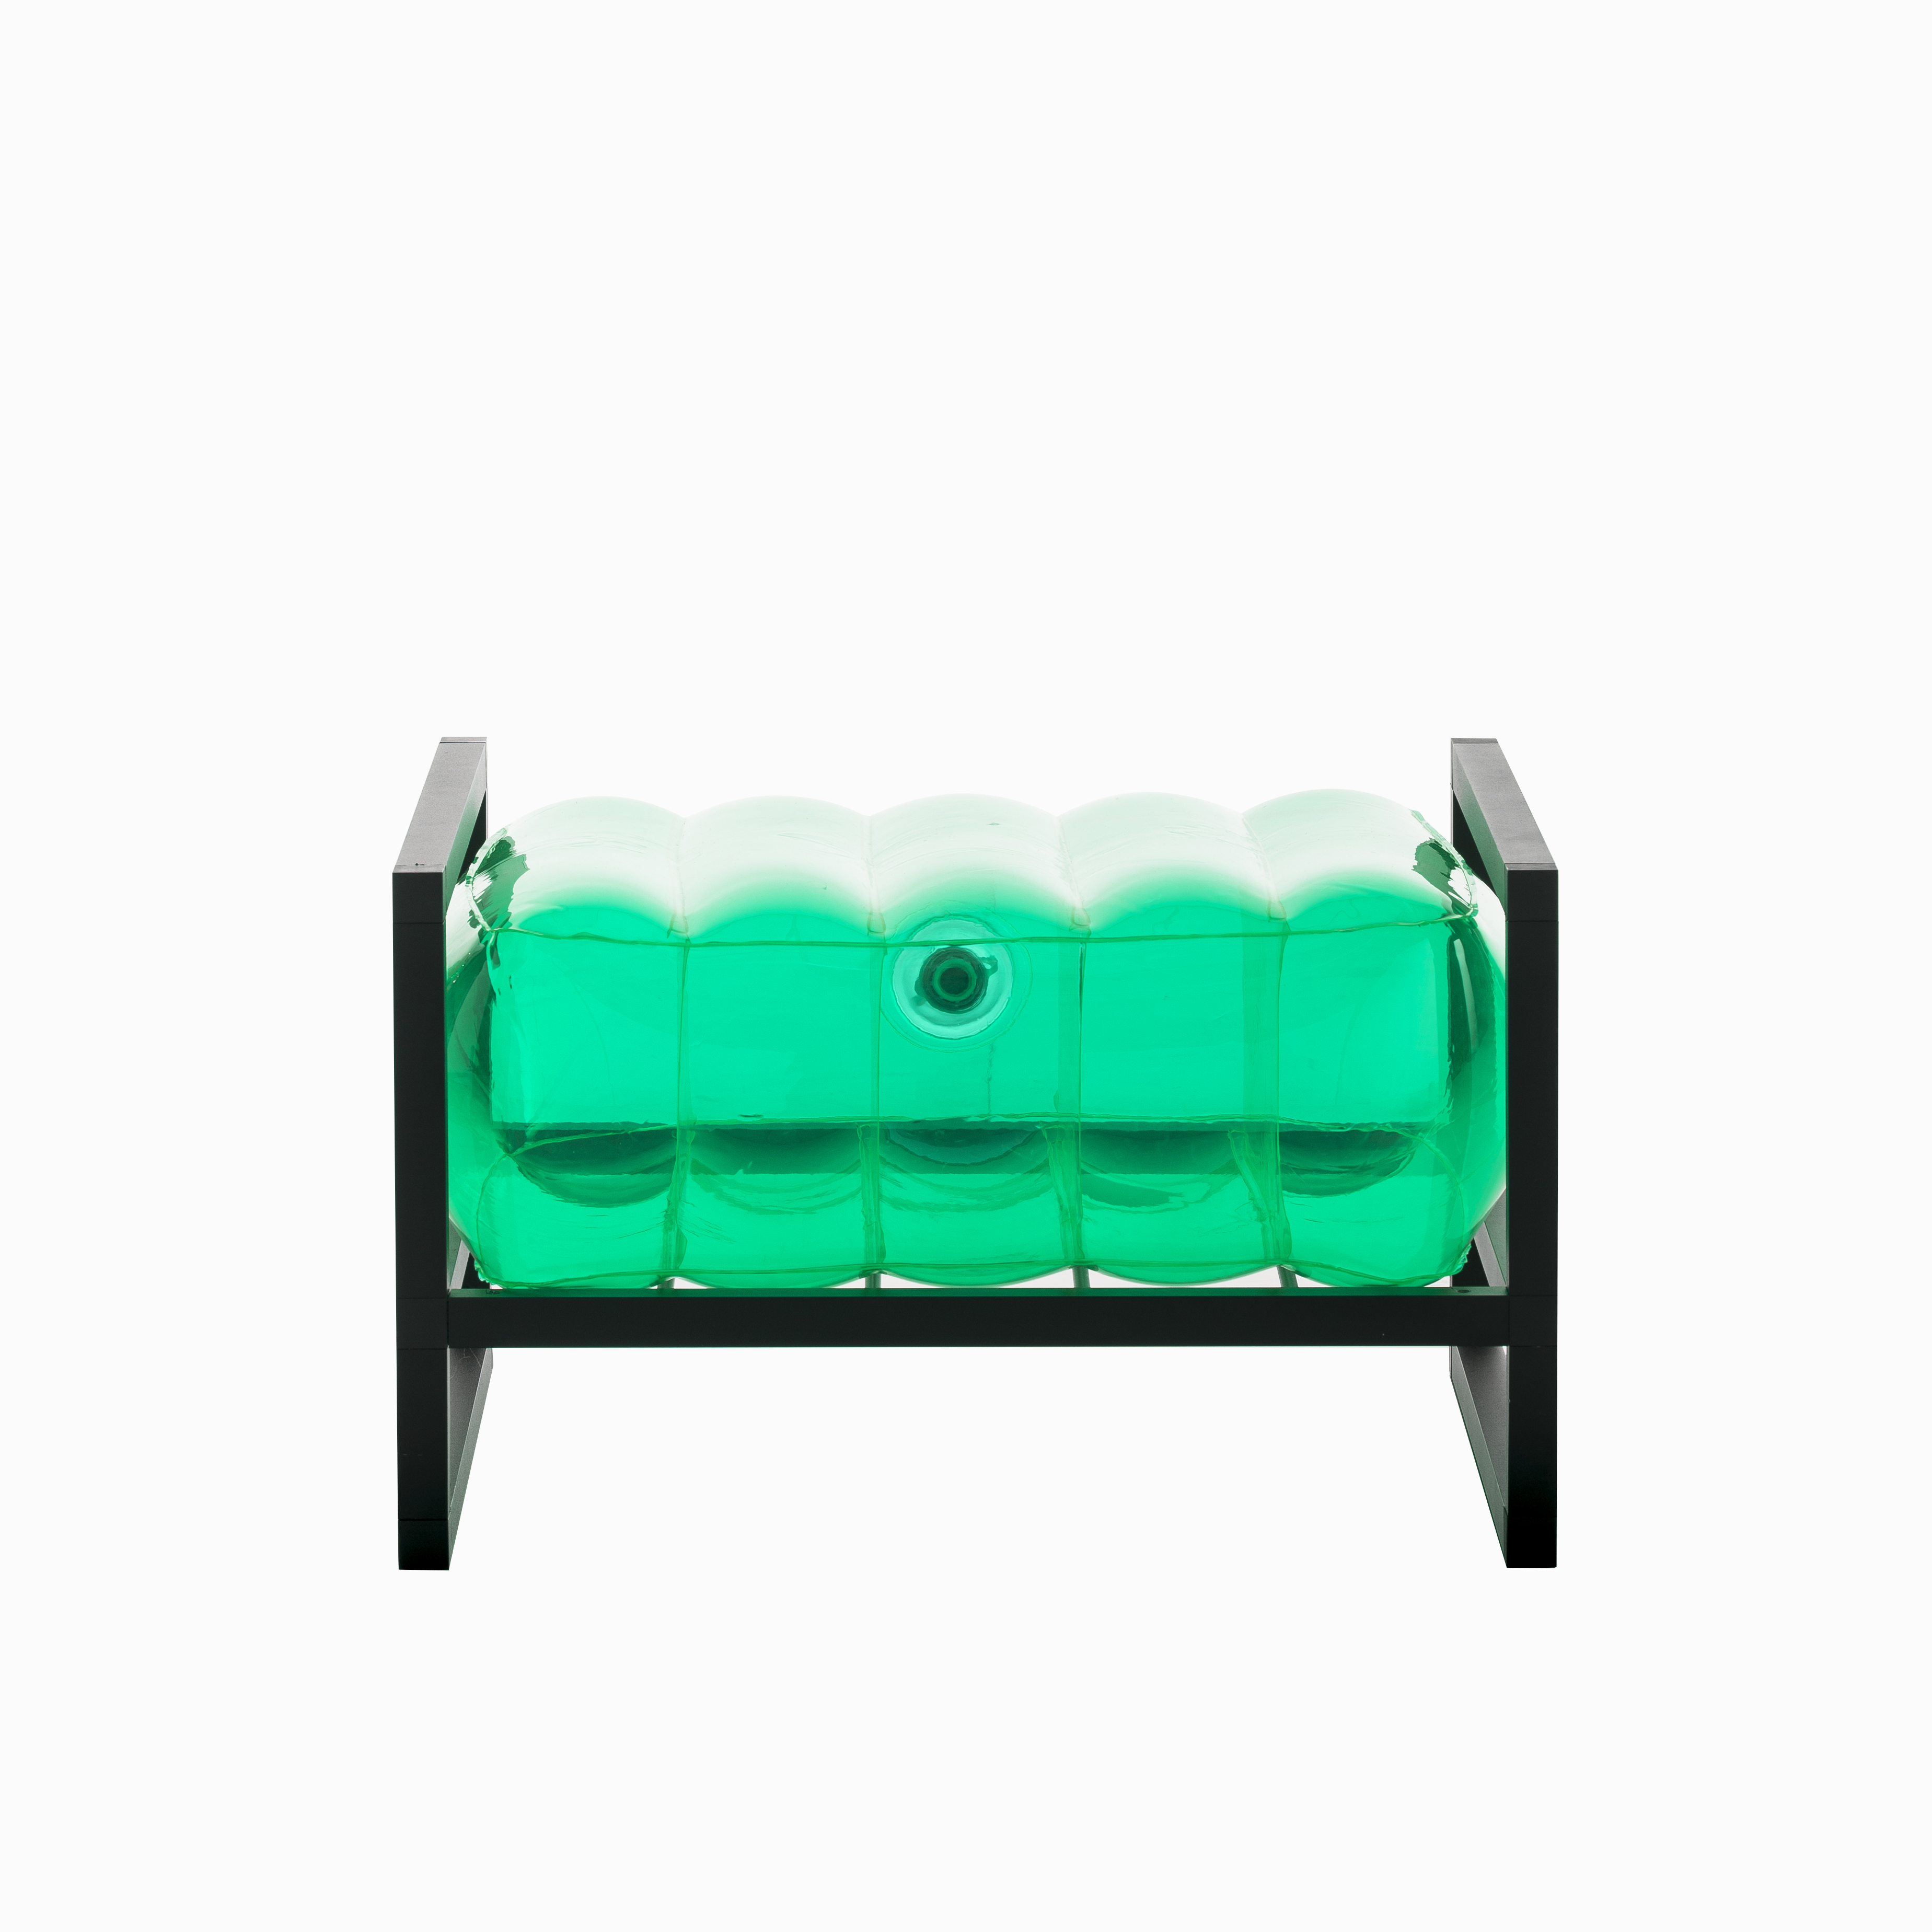 Pouf pvc vert cadre en aluminium